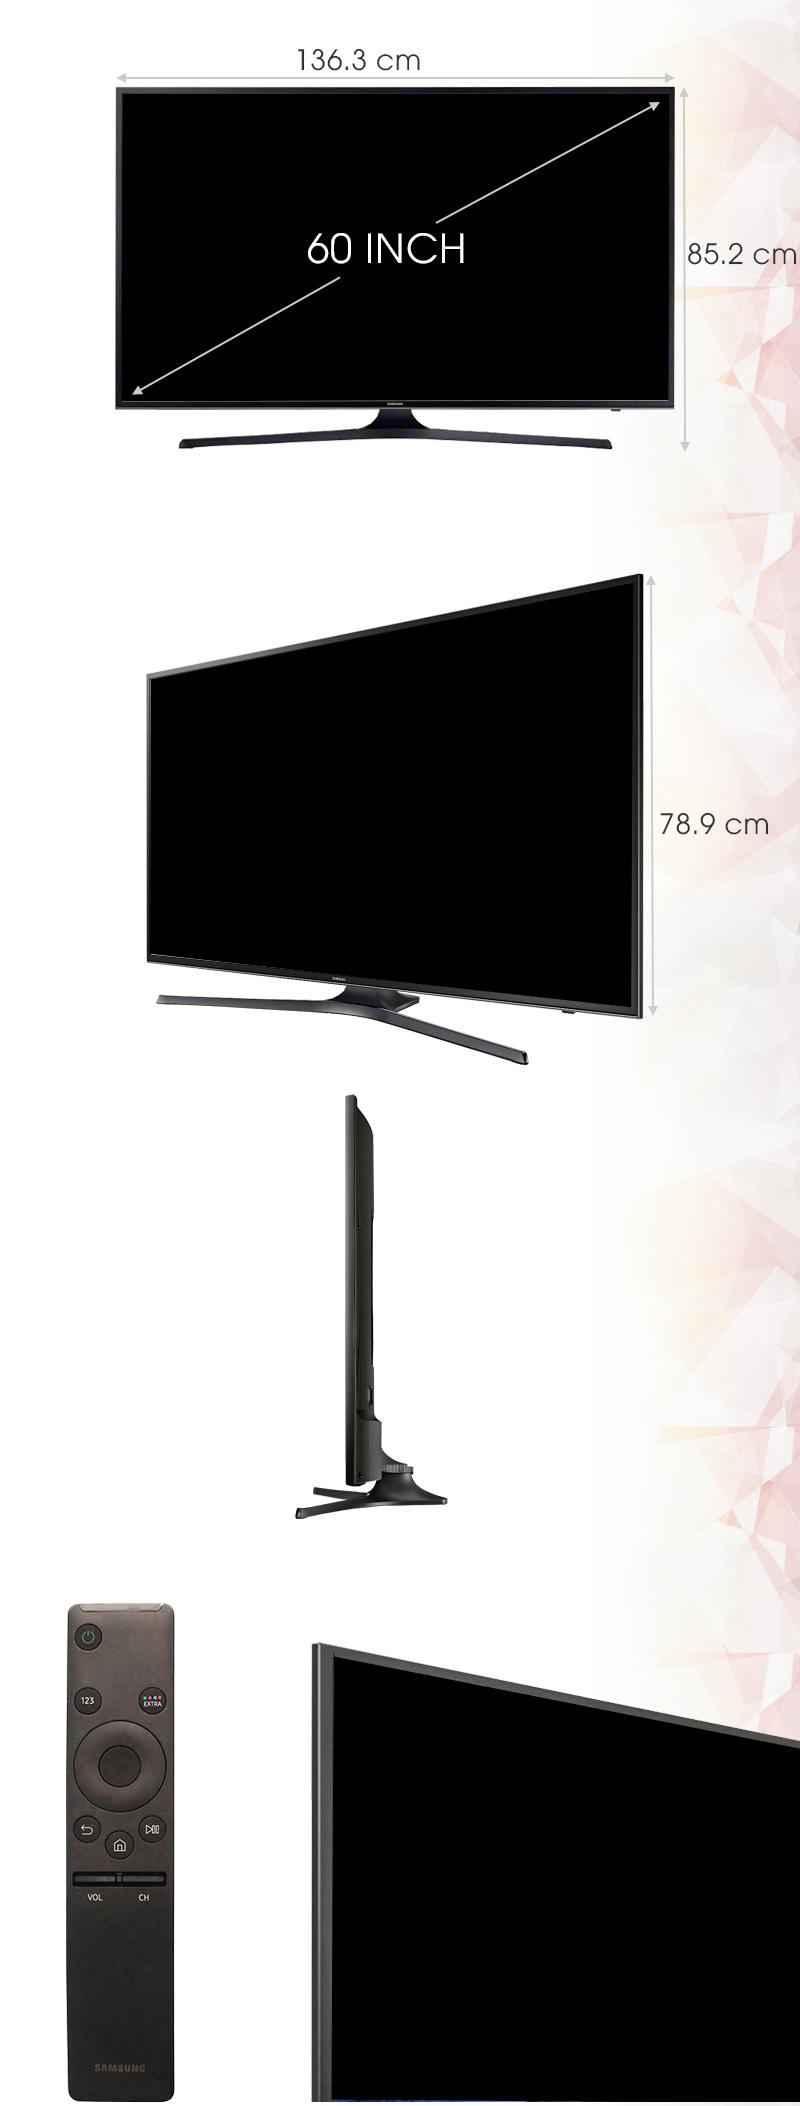 Smart Tivi Samsung 60 inch UA60KU6000 - Kích thước tivi